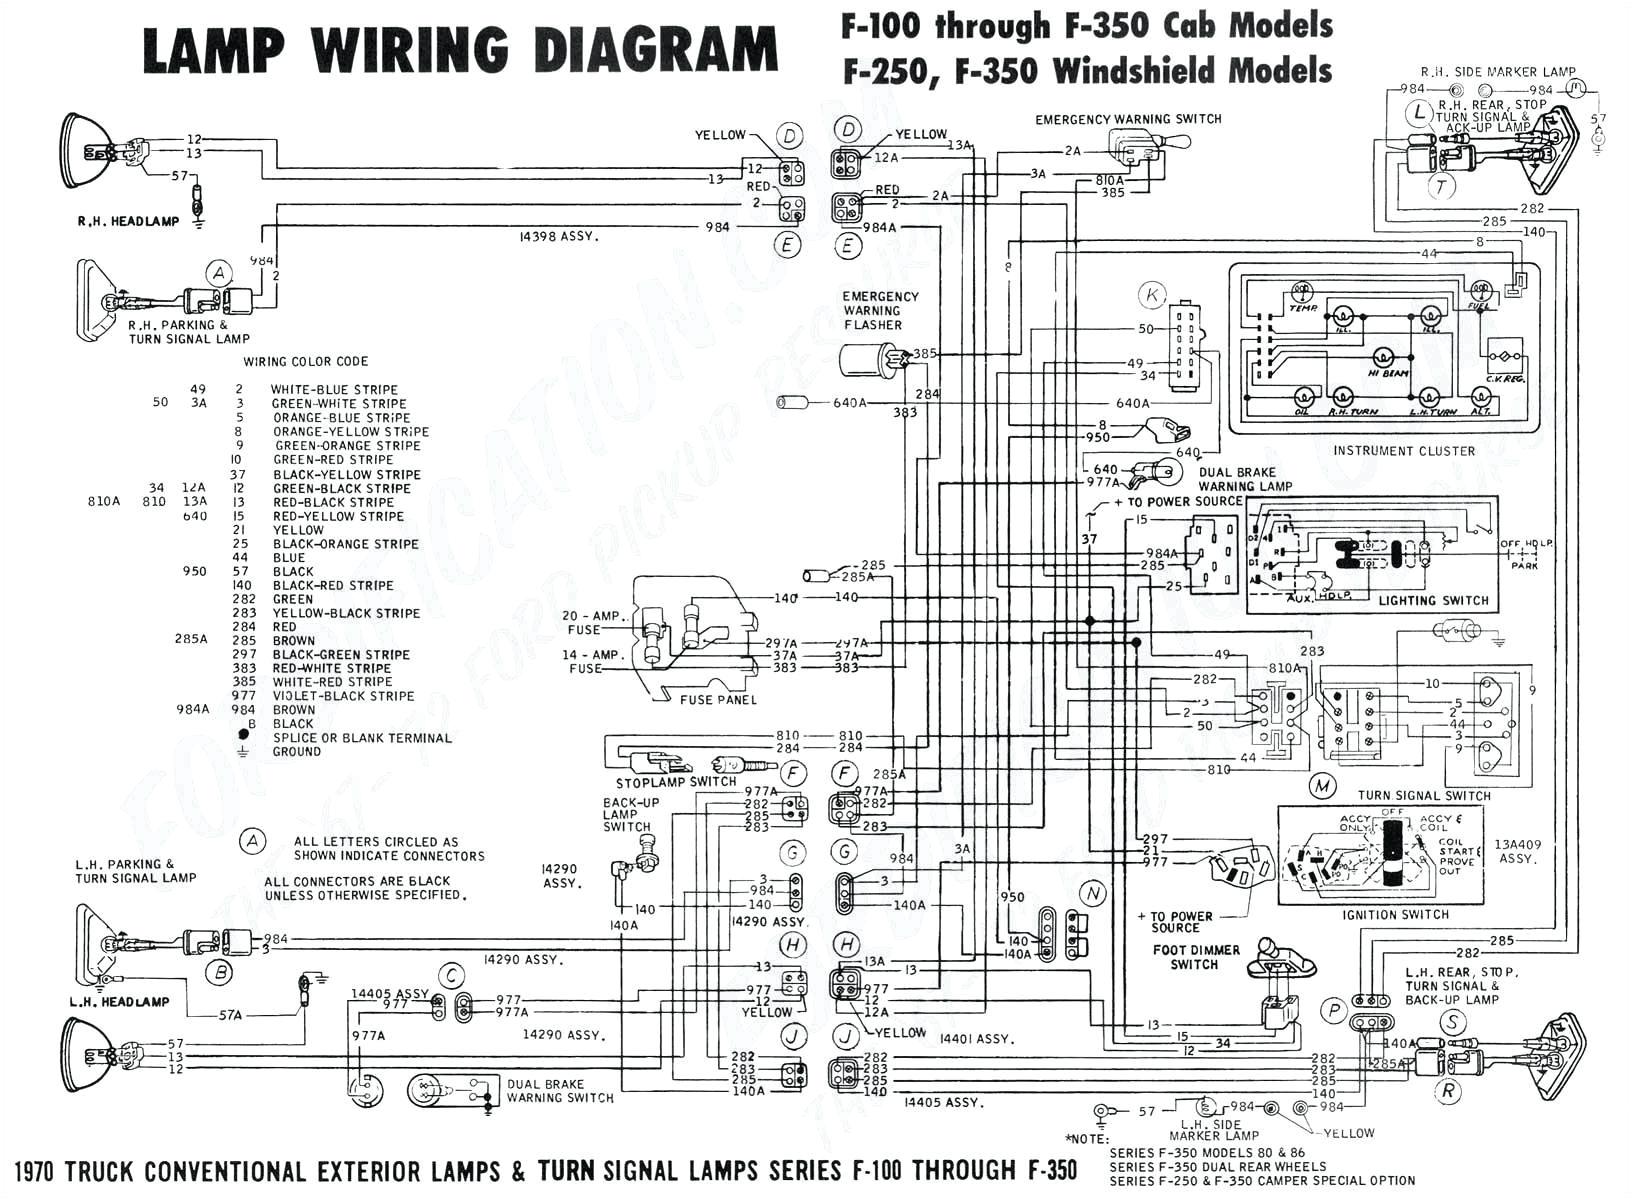 2009 impala fuse diagram wiring diagram new 2009 impala wiring diagram 2009 chevy impala fuse box